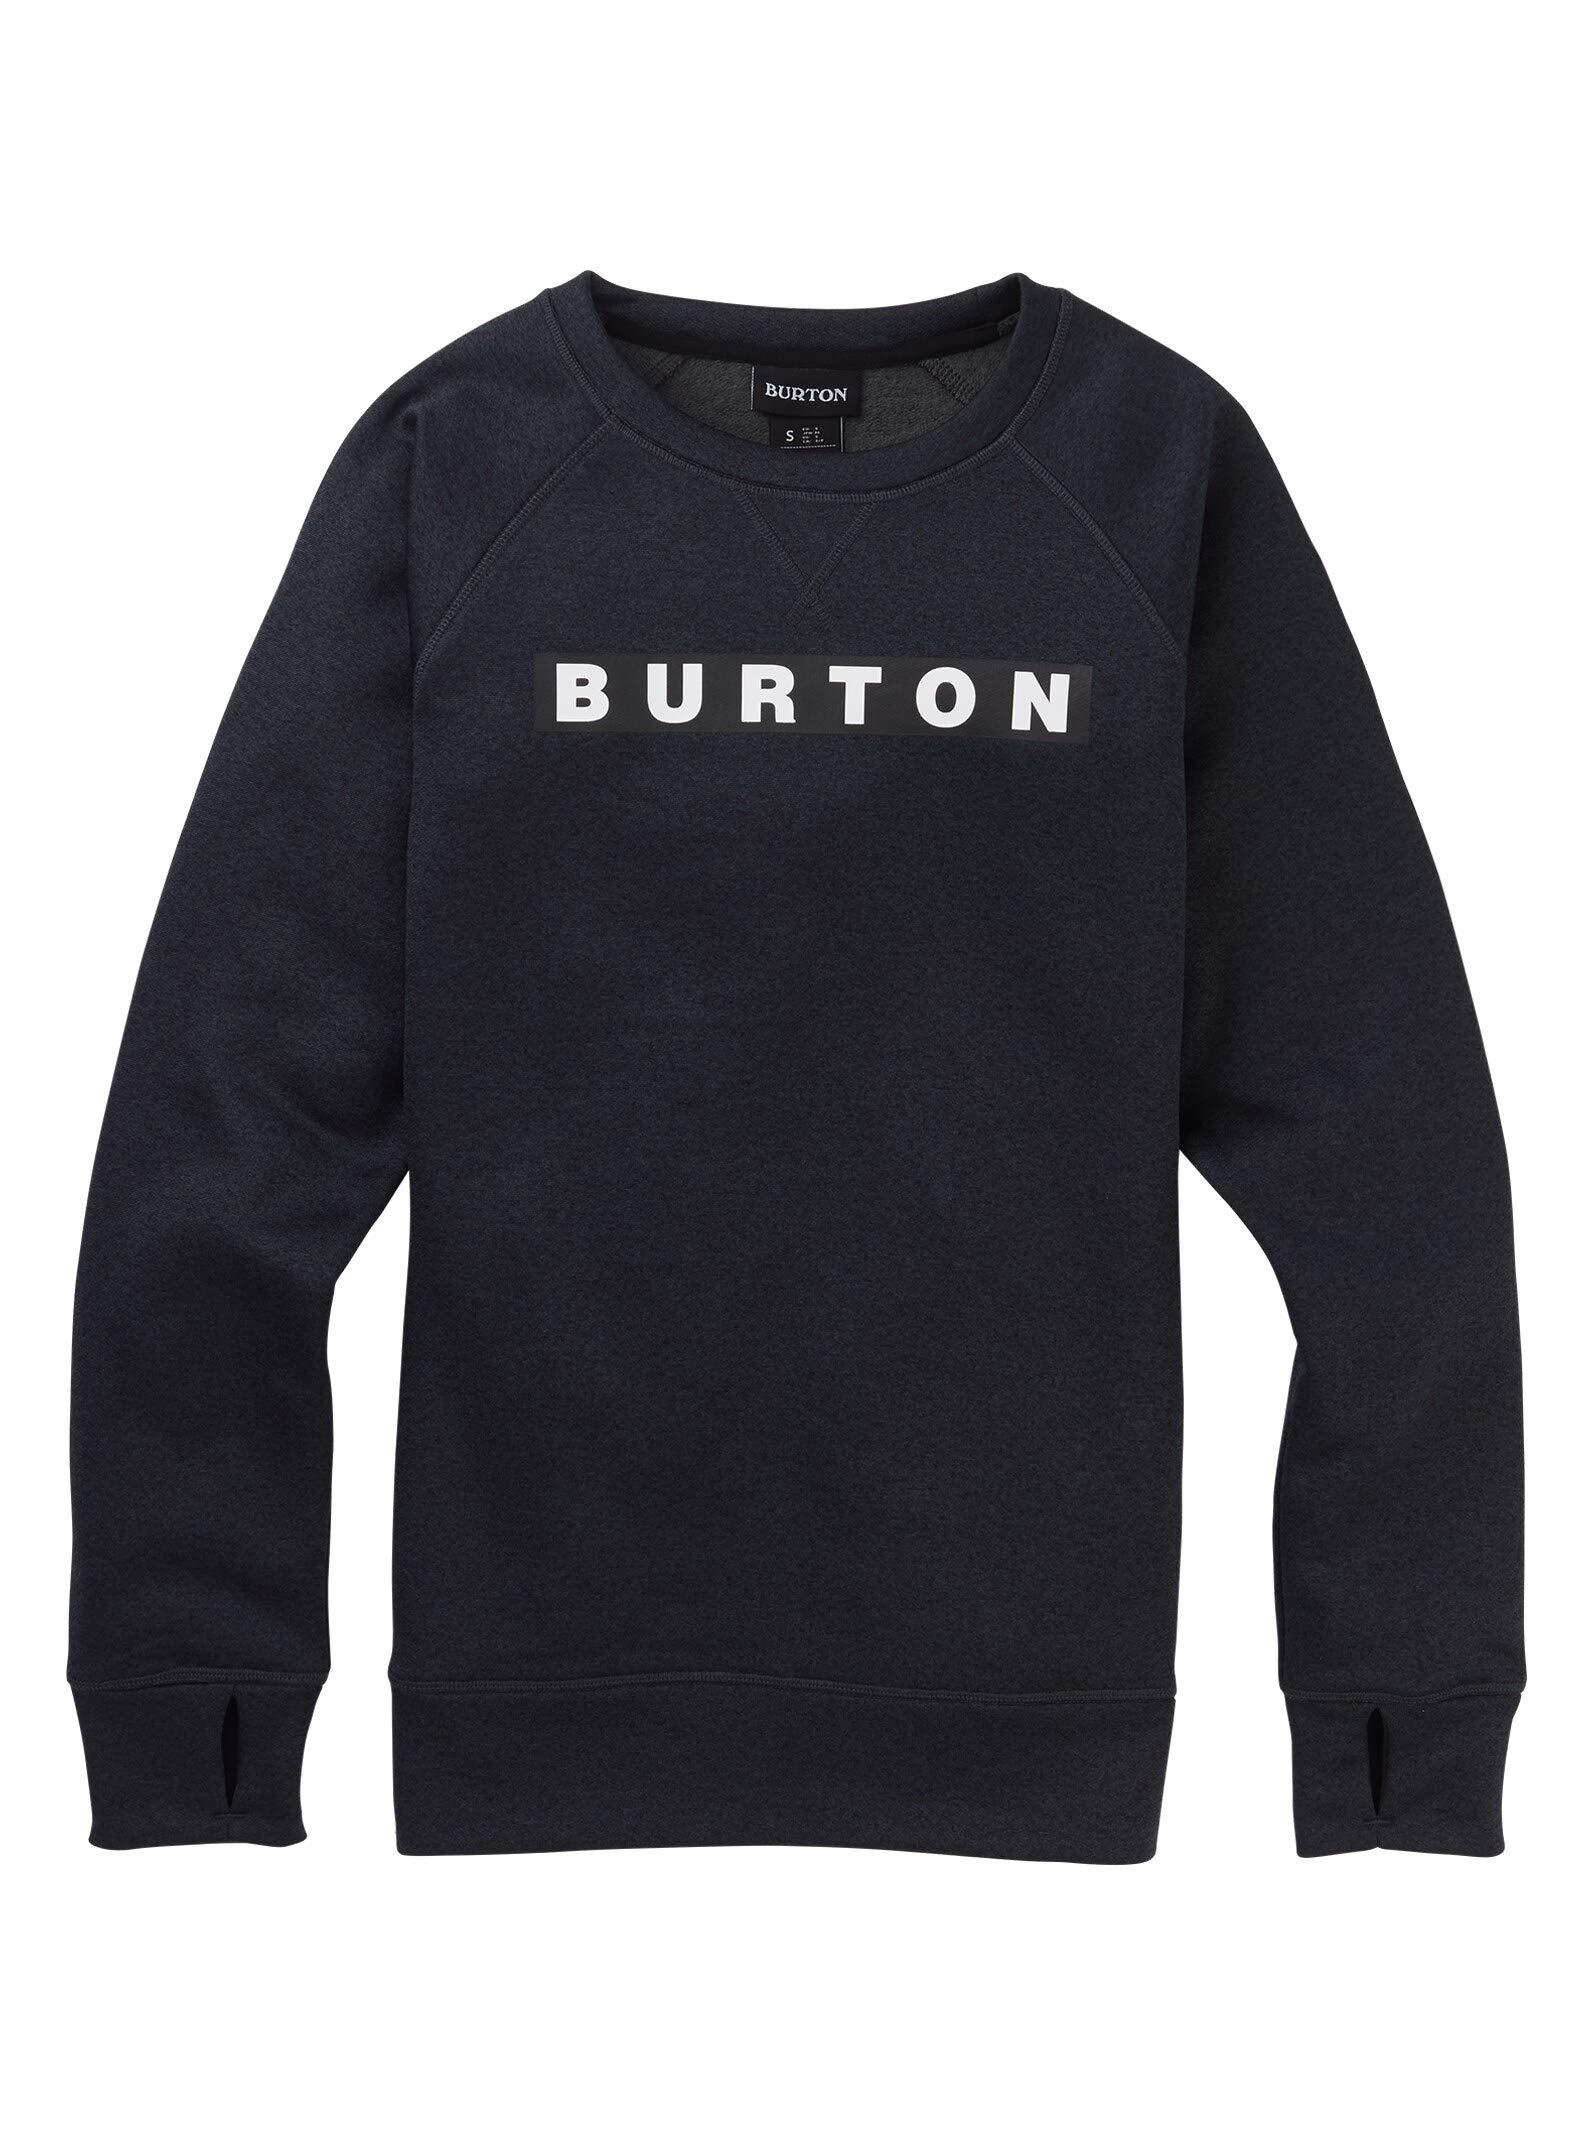 Burton Women's Oak Crew Sweatshirt, True Black Heather, Medium by Burton